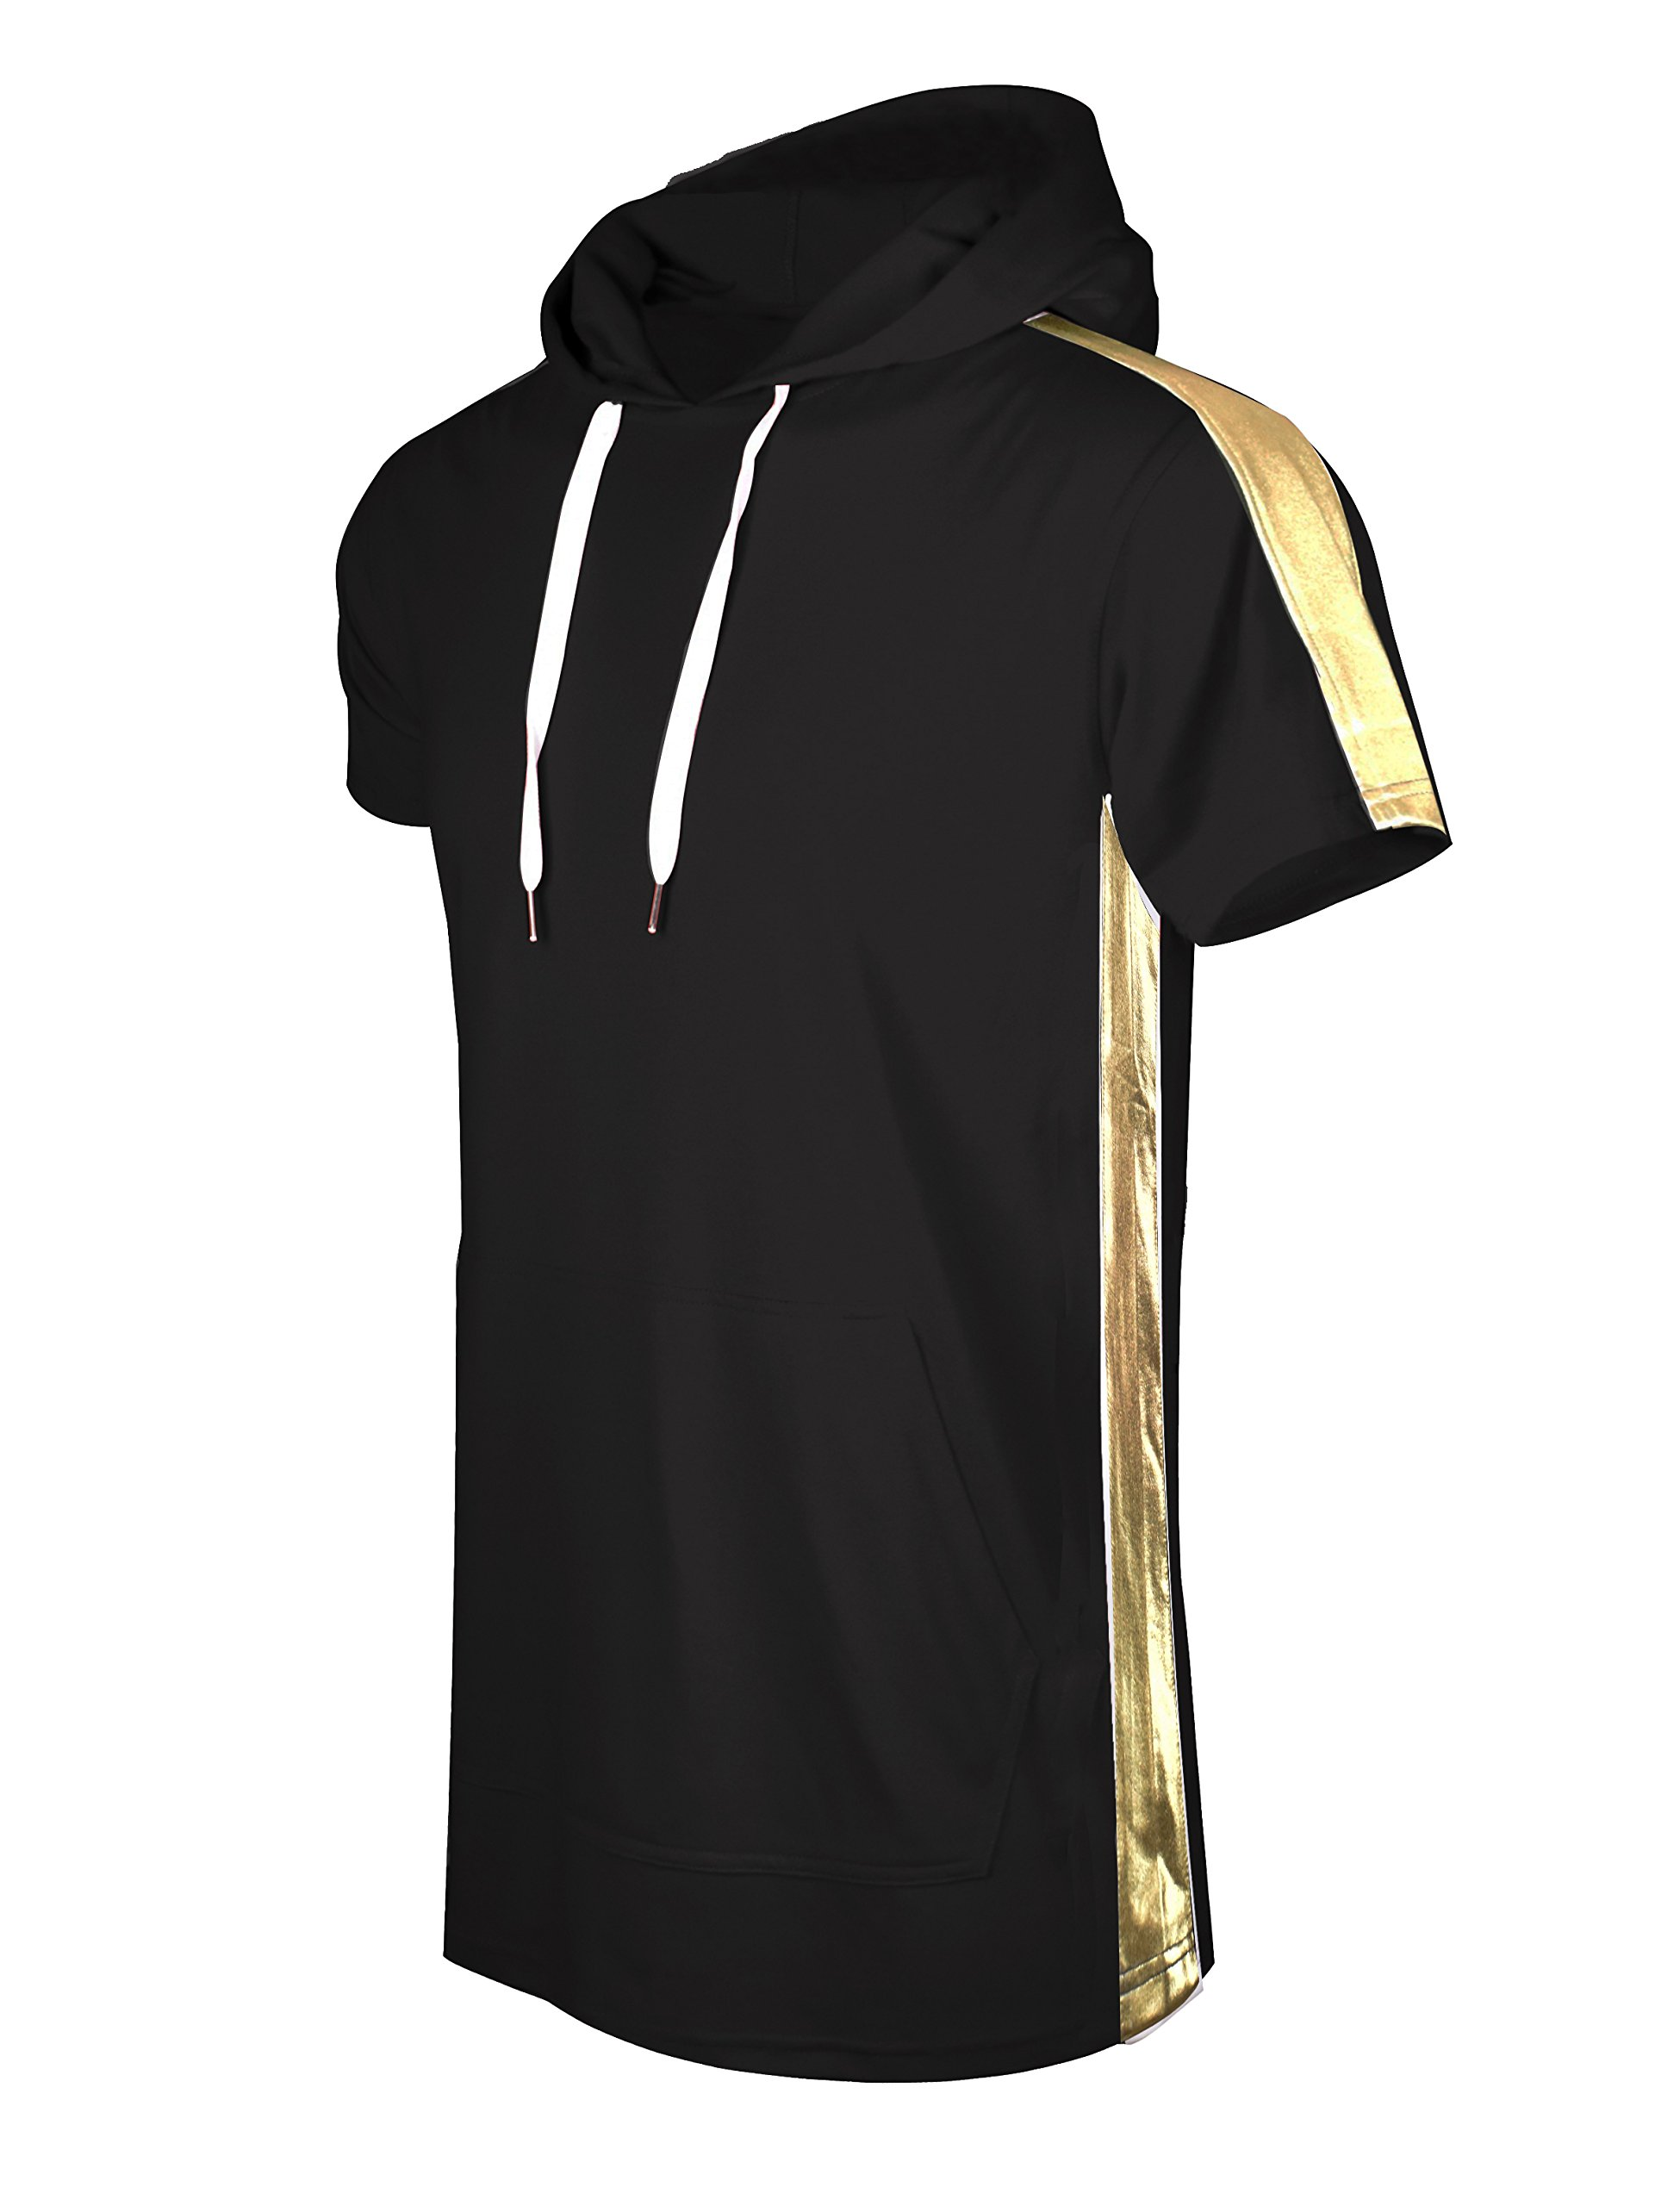 SCREENSHOTBRAND-S11850 Mens Hip Hop Longline Premium Tee - Pullover Short Sleeve Fashion Hooded Shirt Side Stripe Basic-Black/Gold-Medium by SCREENSHOT BRAND